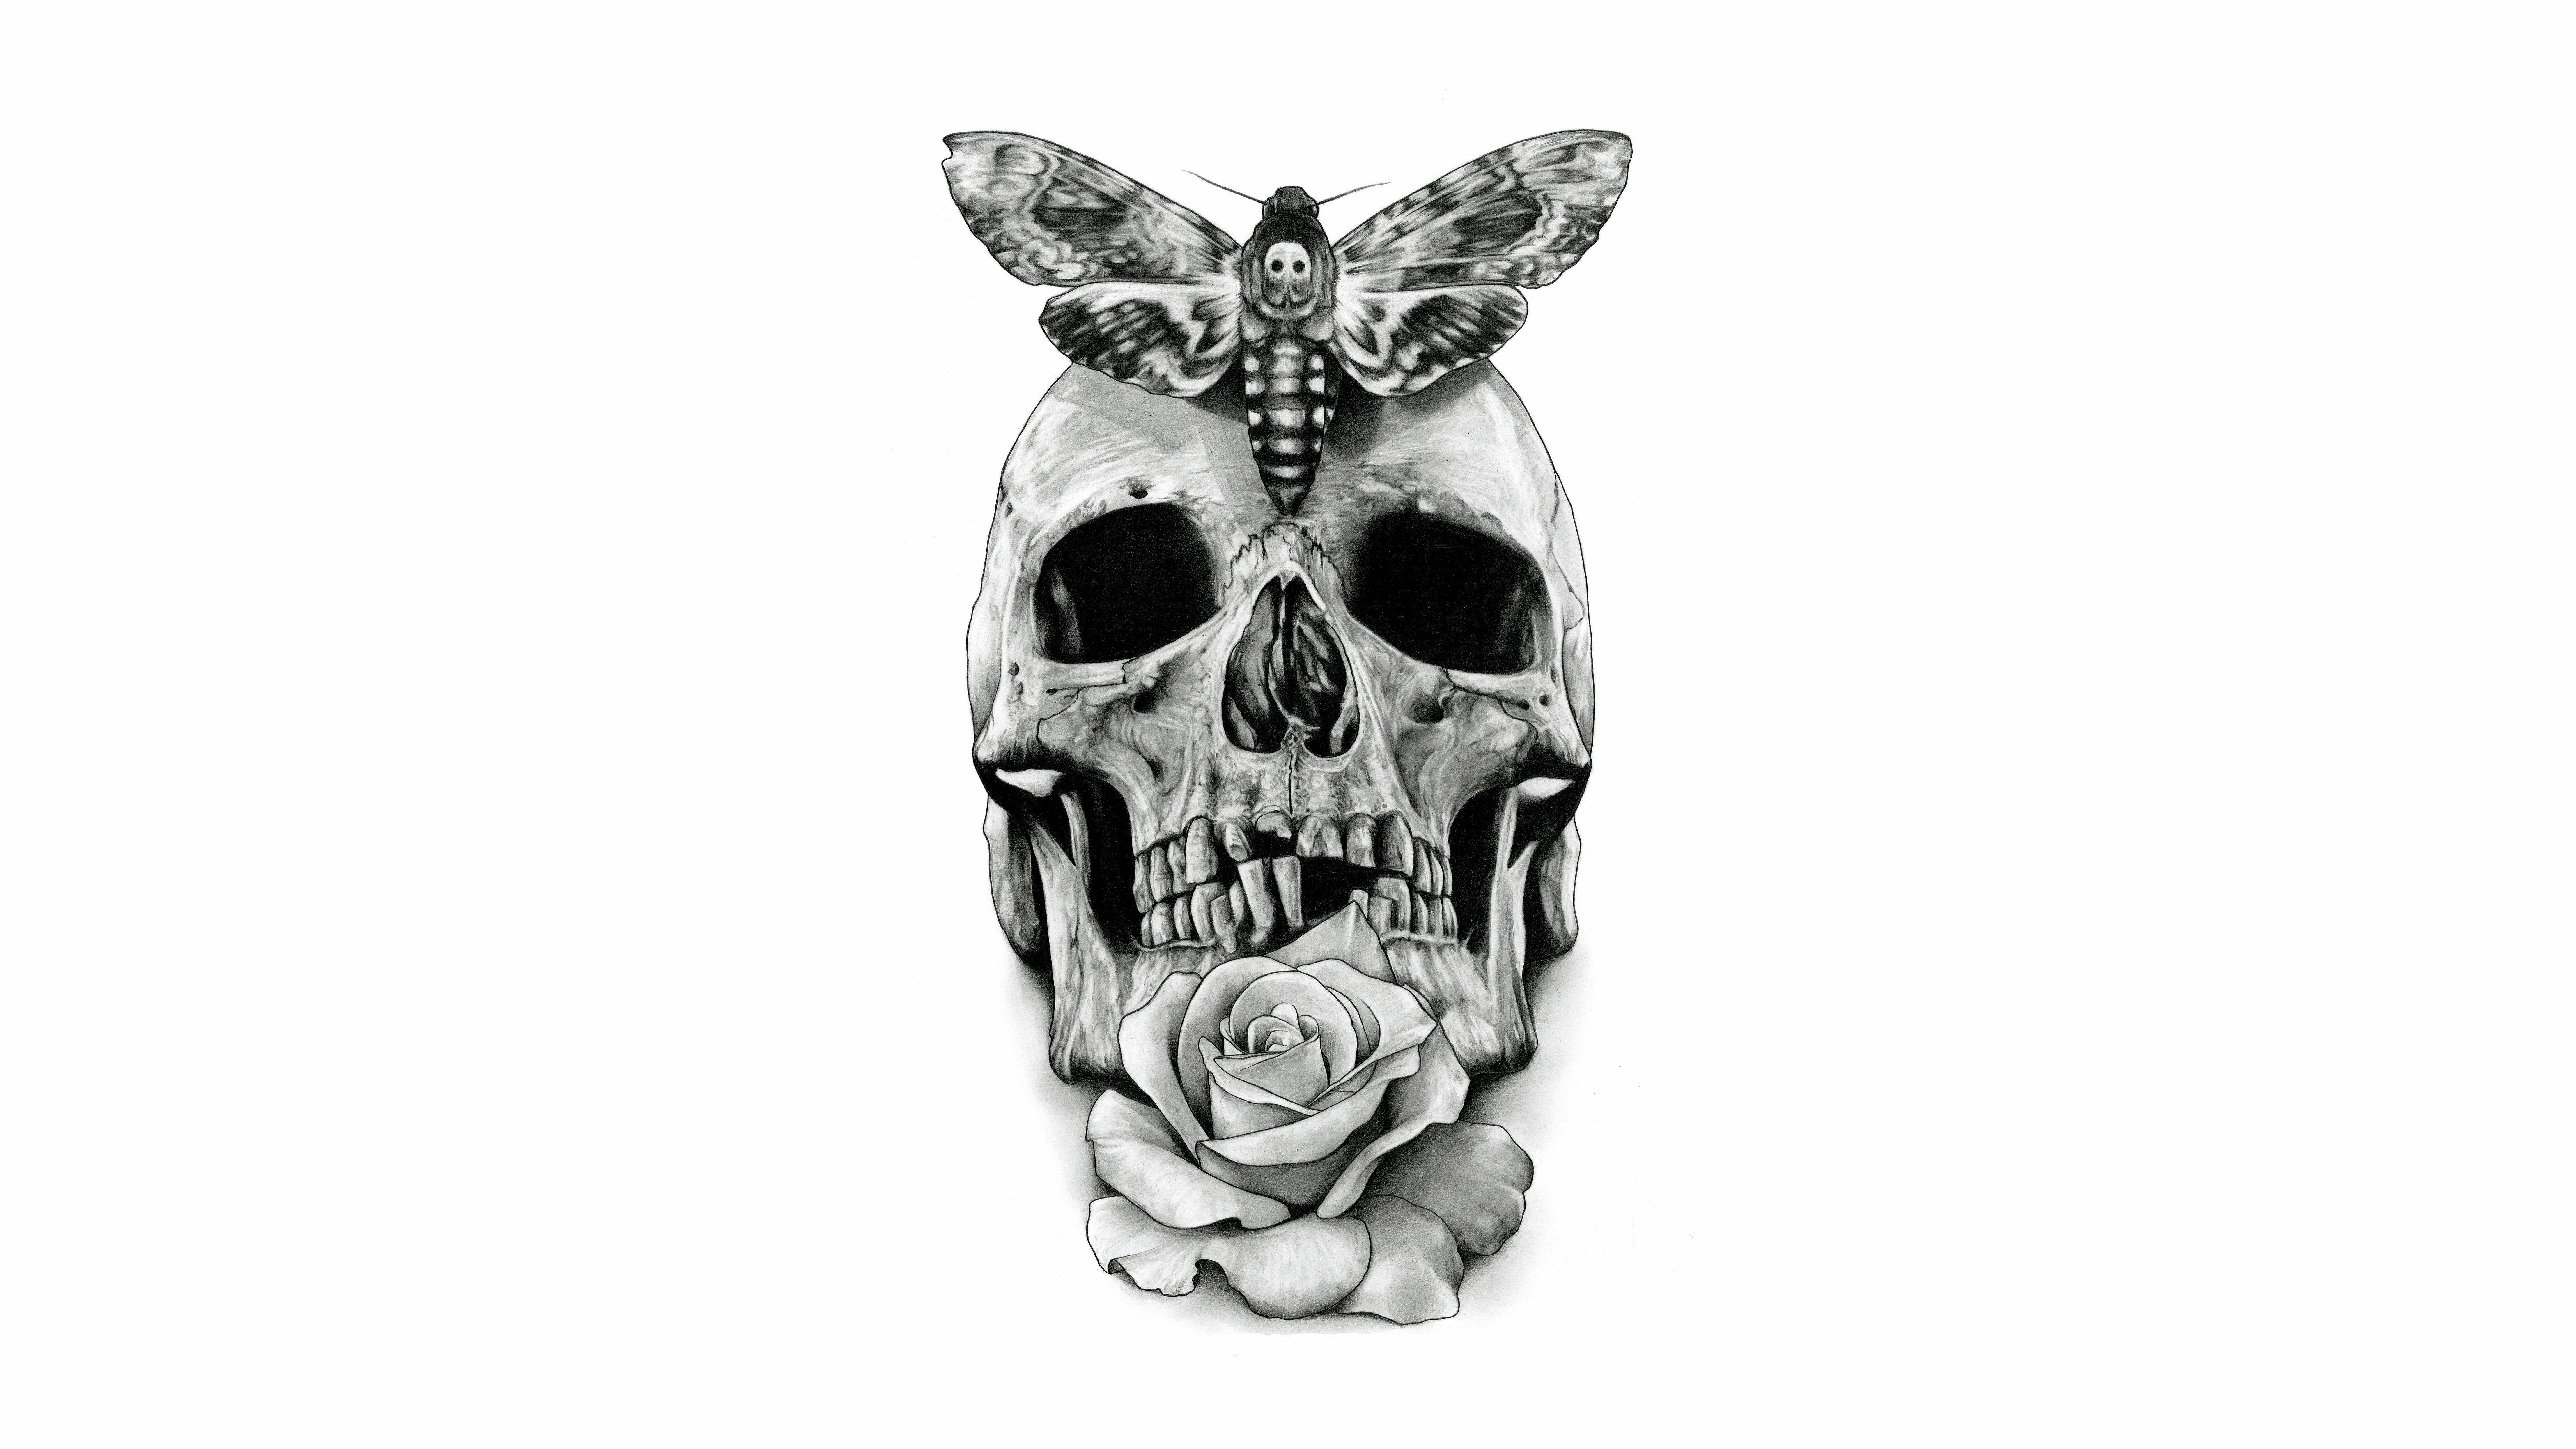 Skull 8k Ultra HD Wallpaper | Background Image | 8850x4977